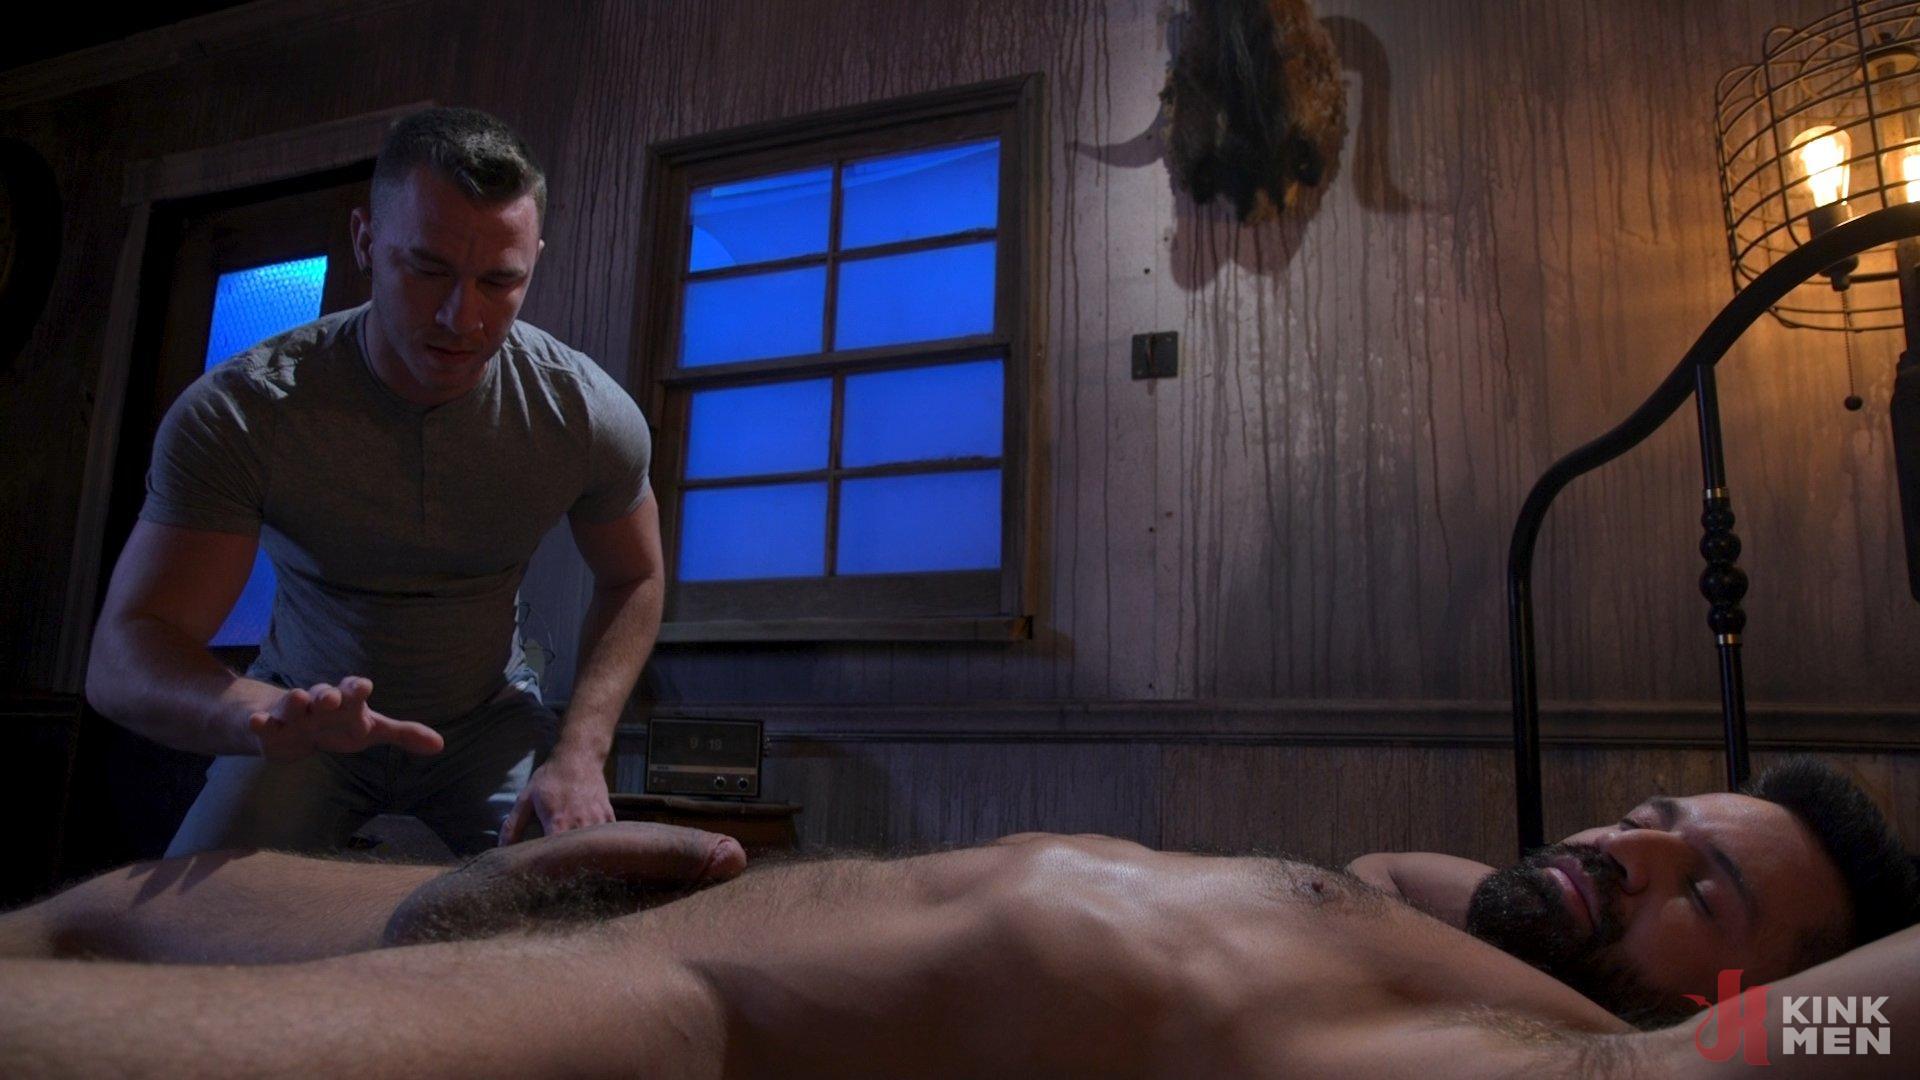 Screenshot #1 from Housebroken: Beefy Underwear Pervert Breaks Into The Wrong House movie